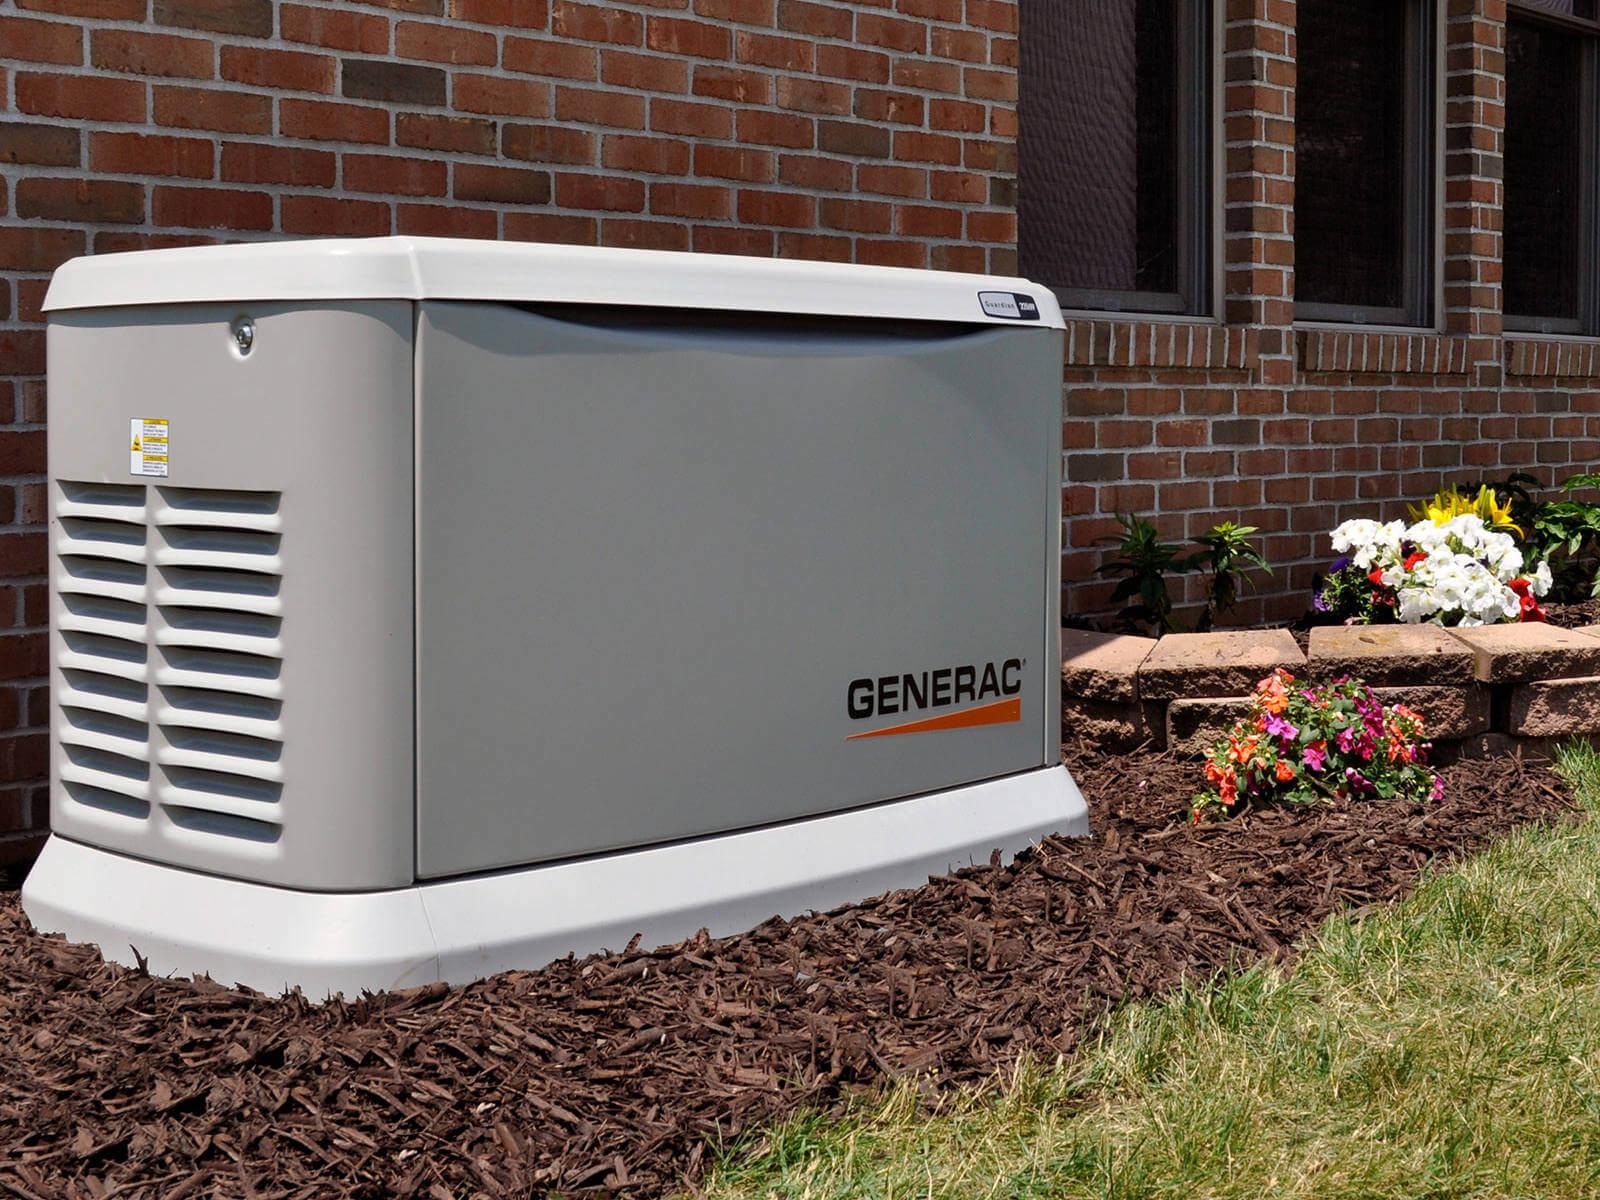 Generac generator outside brick house angle